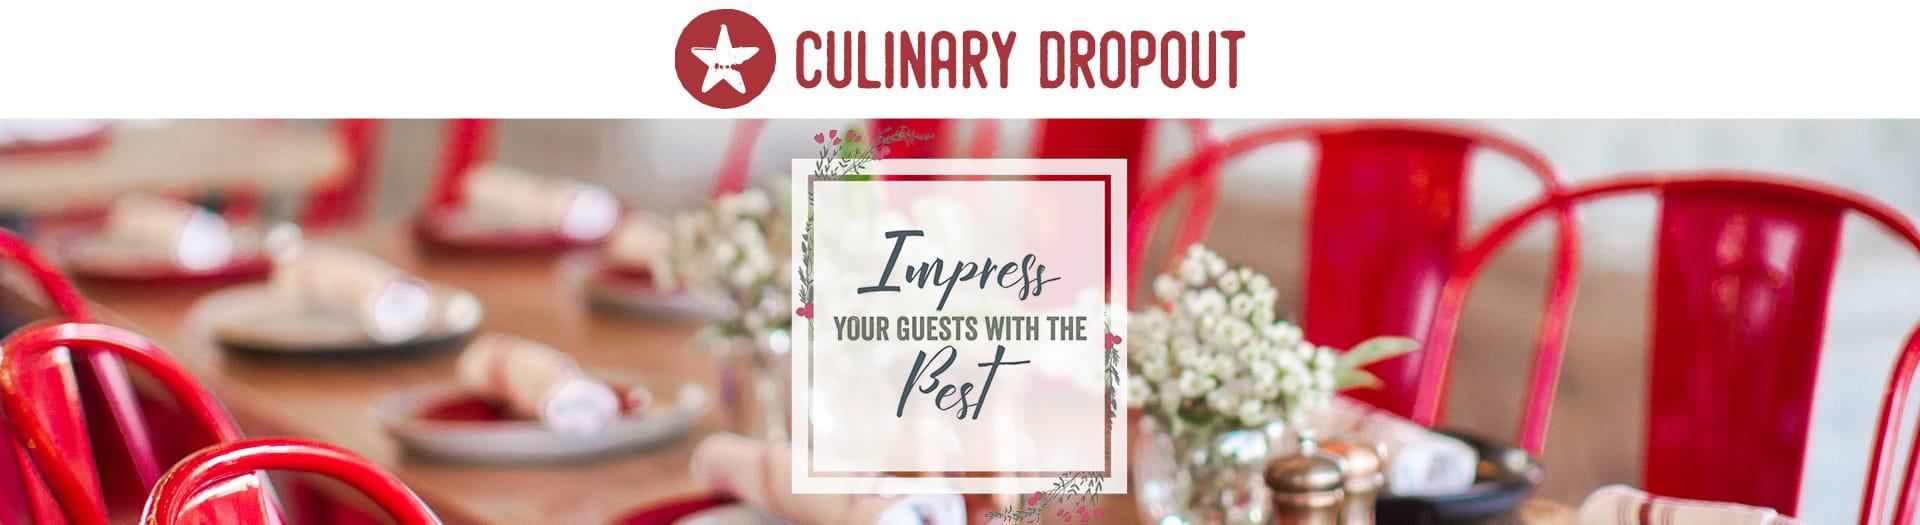 Culinary Dropout – Phoenix - Phoenix, AZ